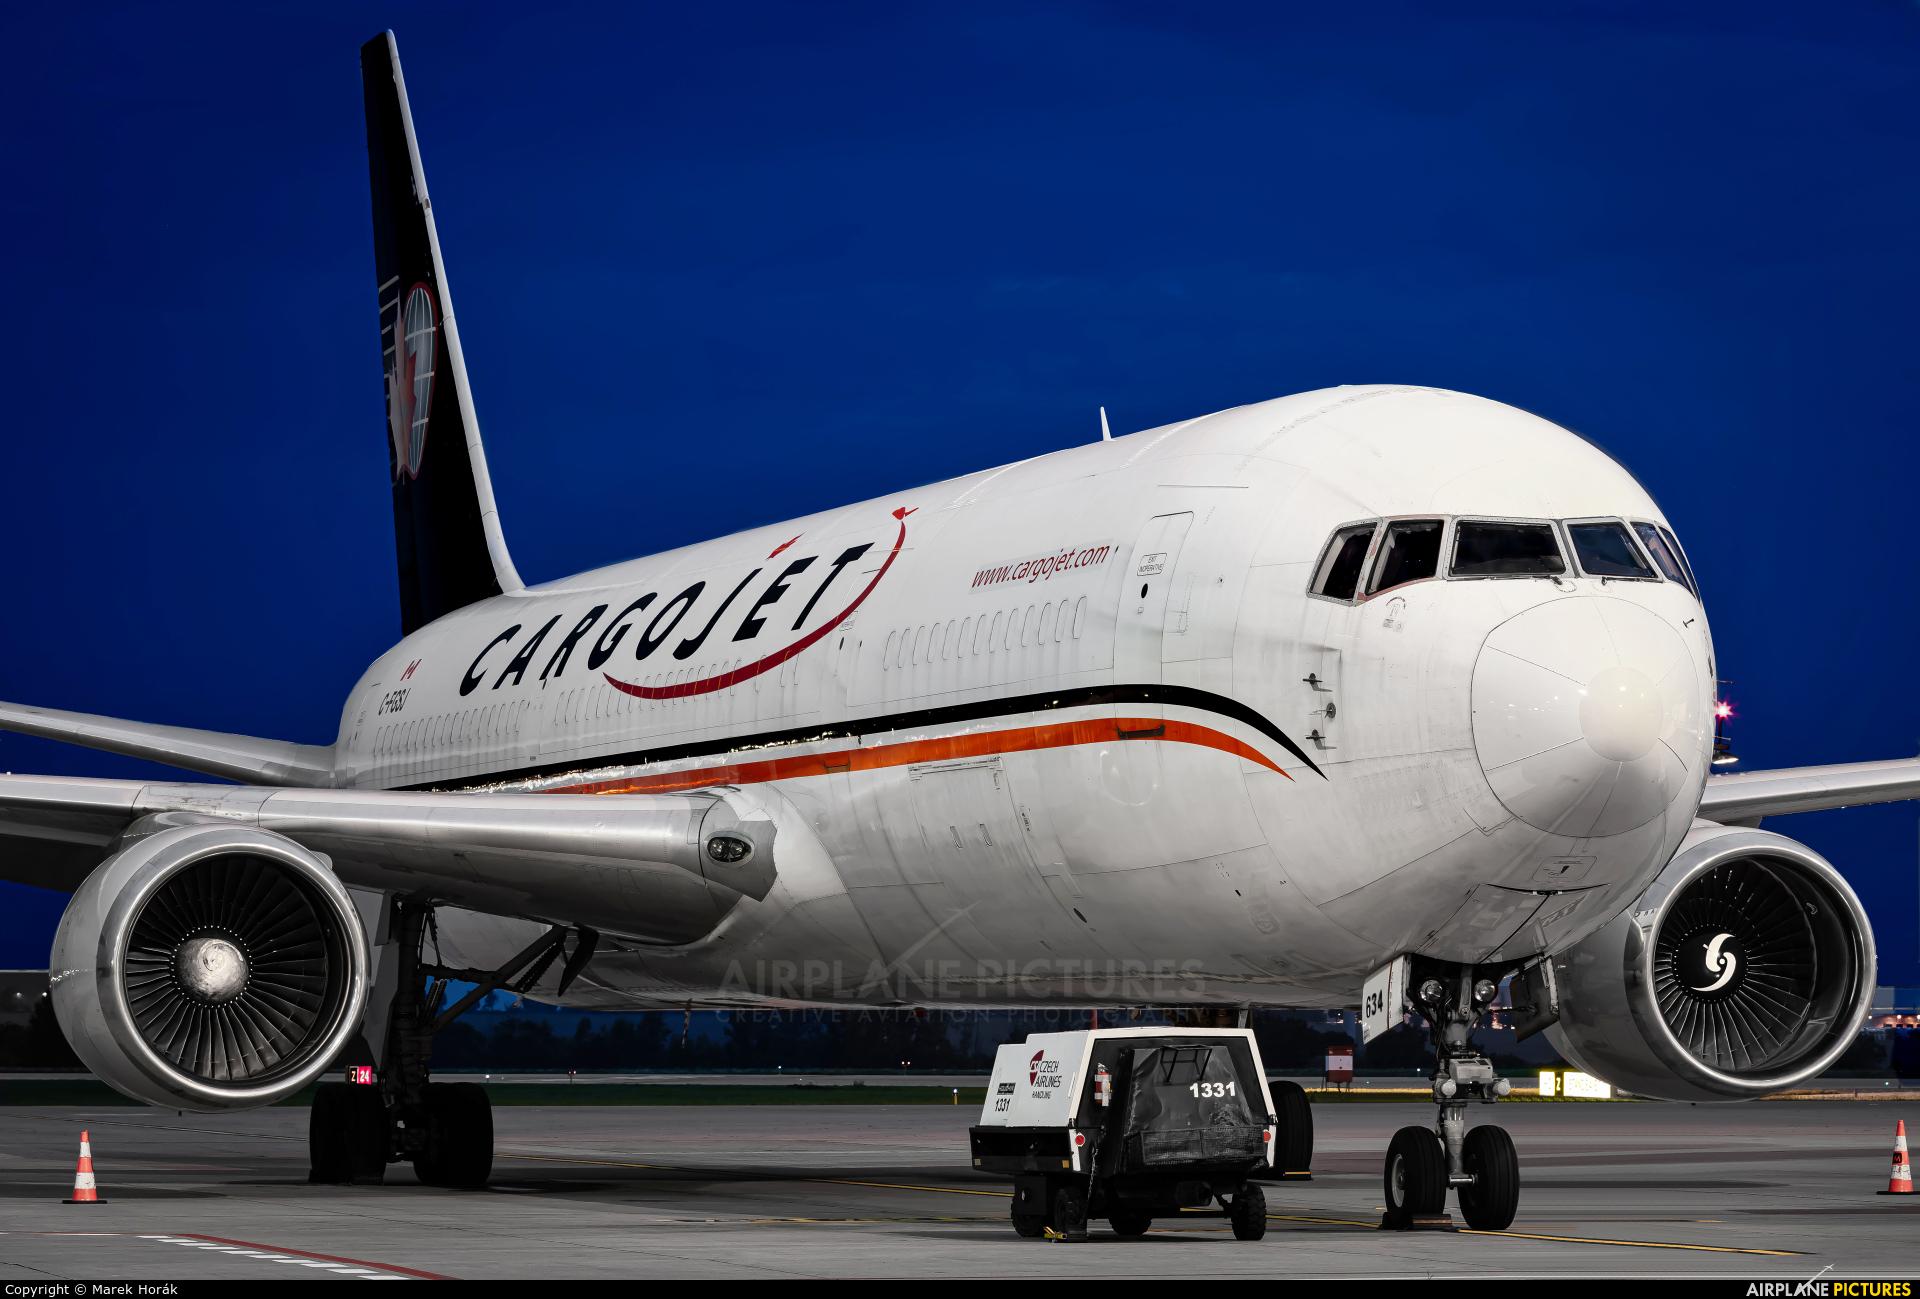 Cargojet Airways C-FGSJ aircraft at Prague - Václav Havel